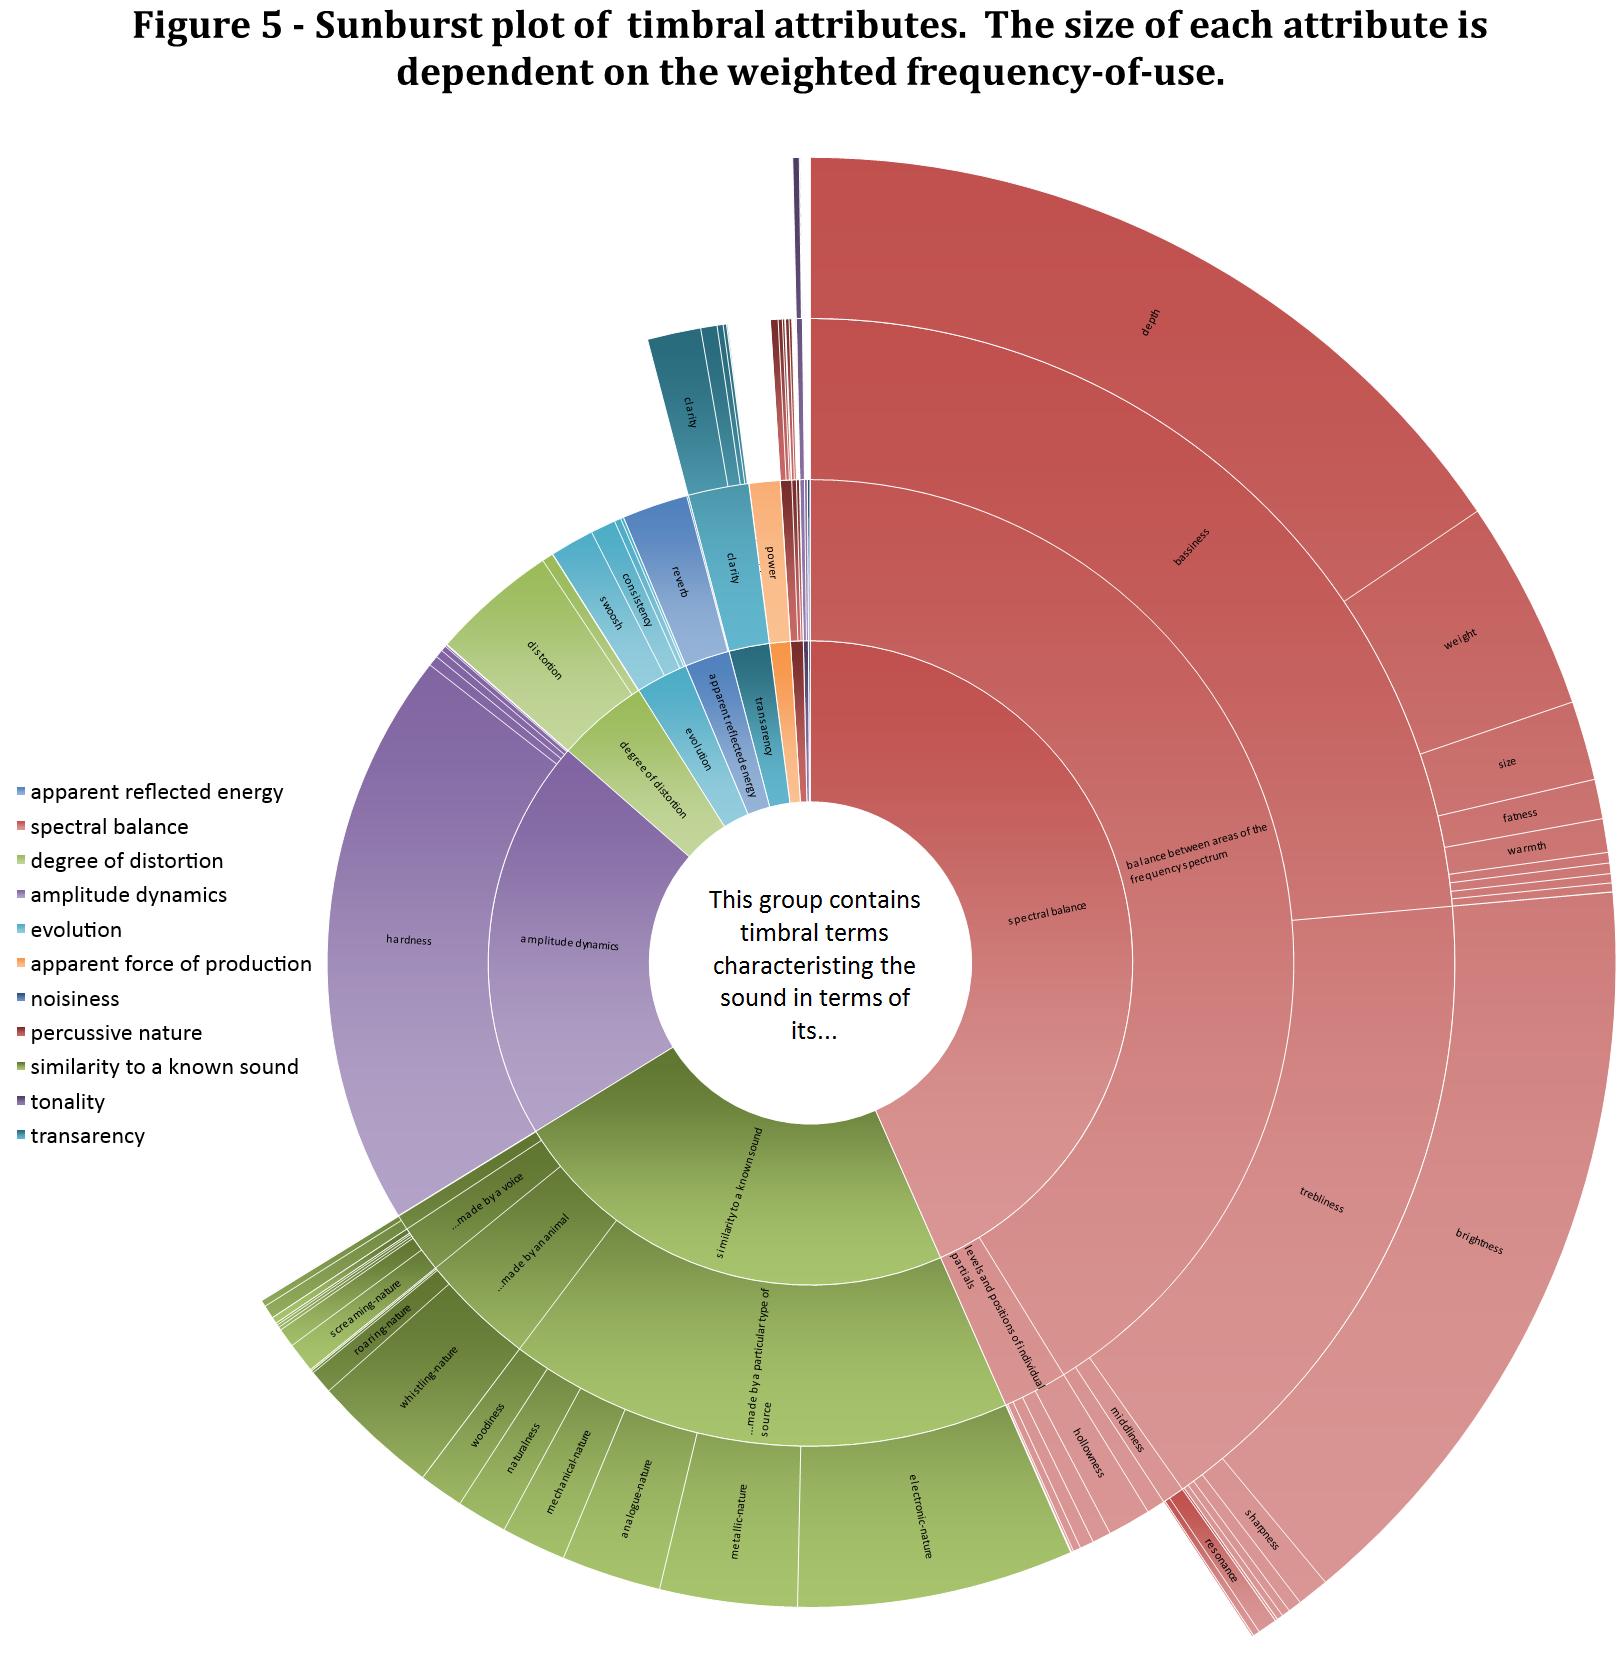 Retrieval of Drum Samples by High-Level Descriptors